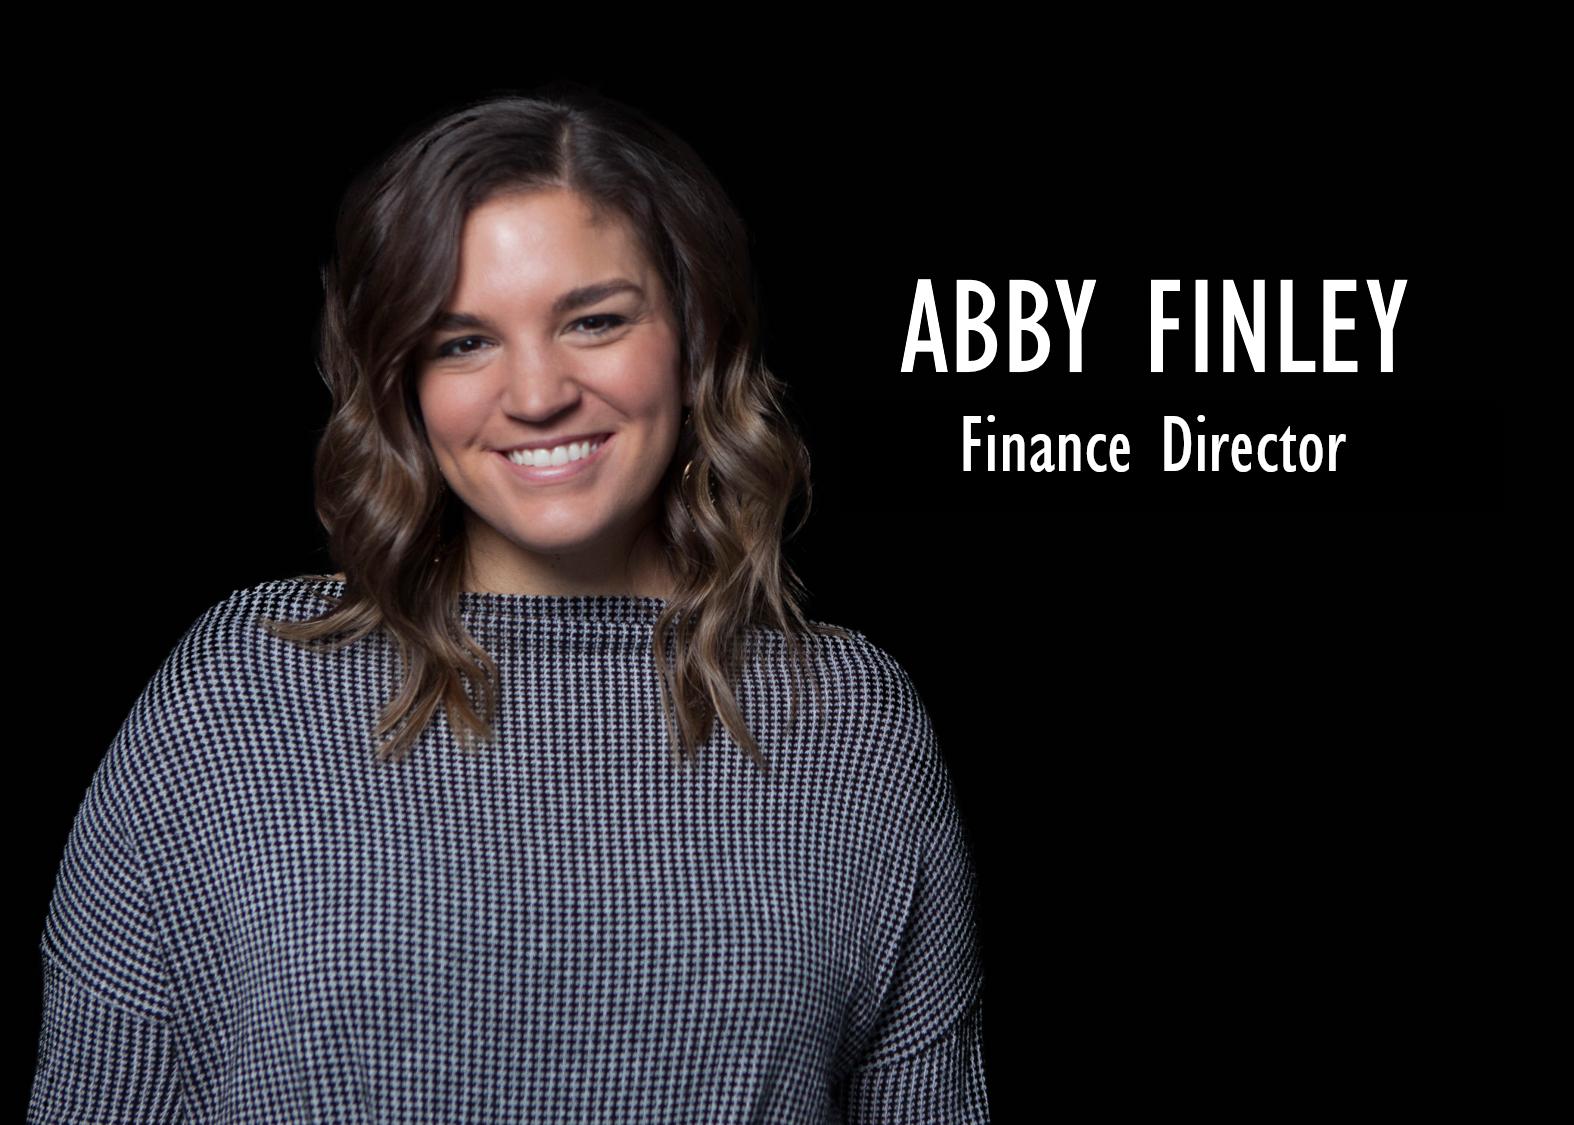 Abby Finley